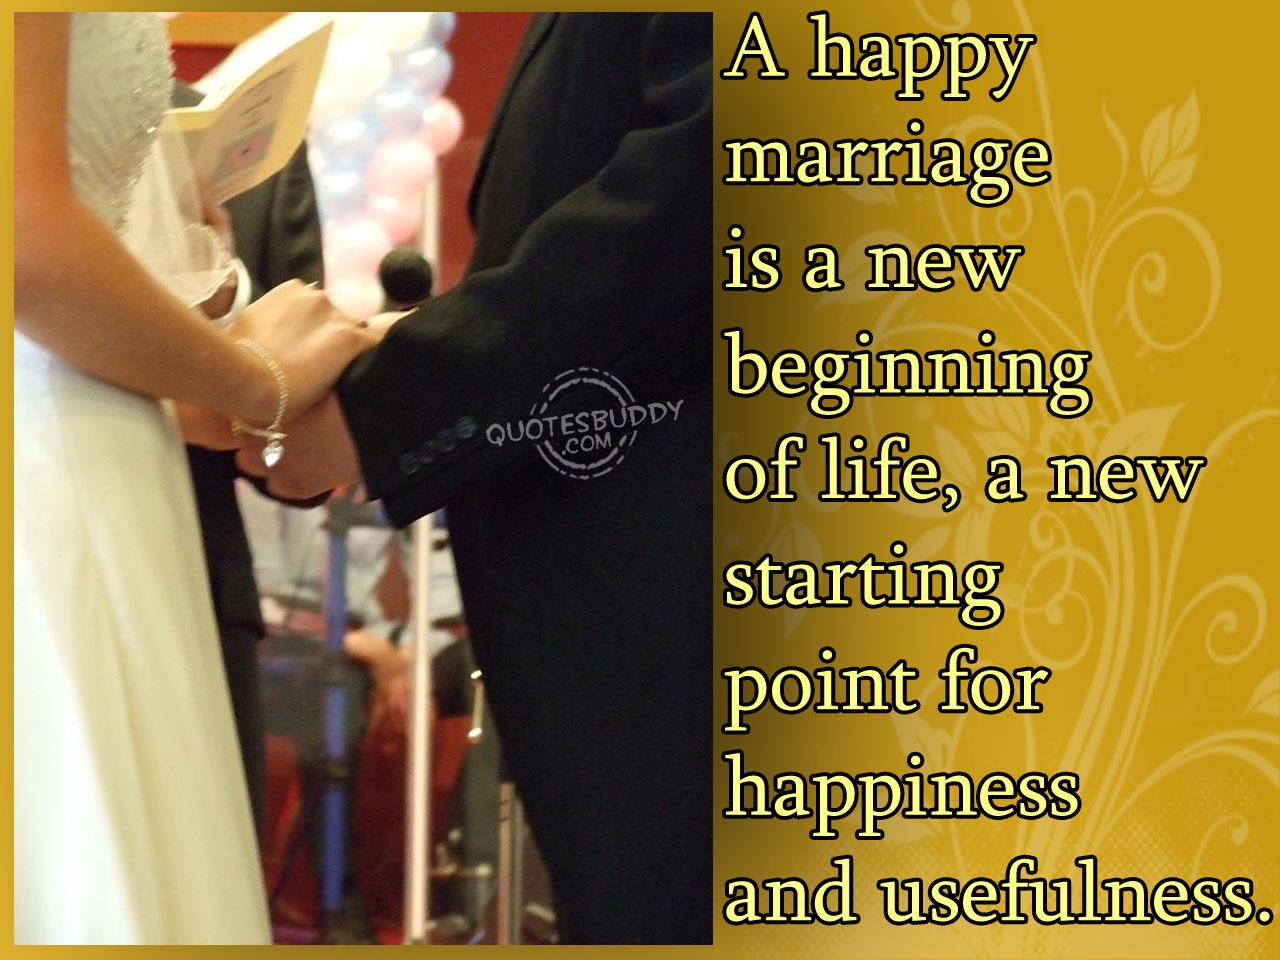 Hindu Quotes On Marriage Quotesgram